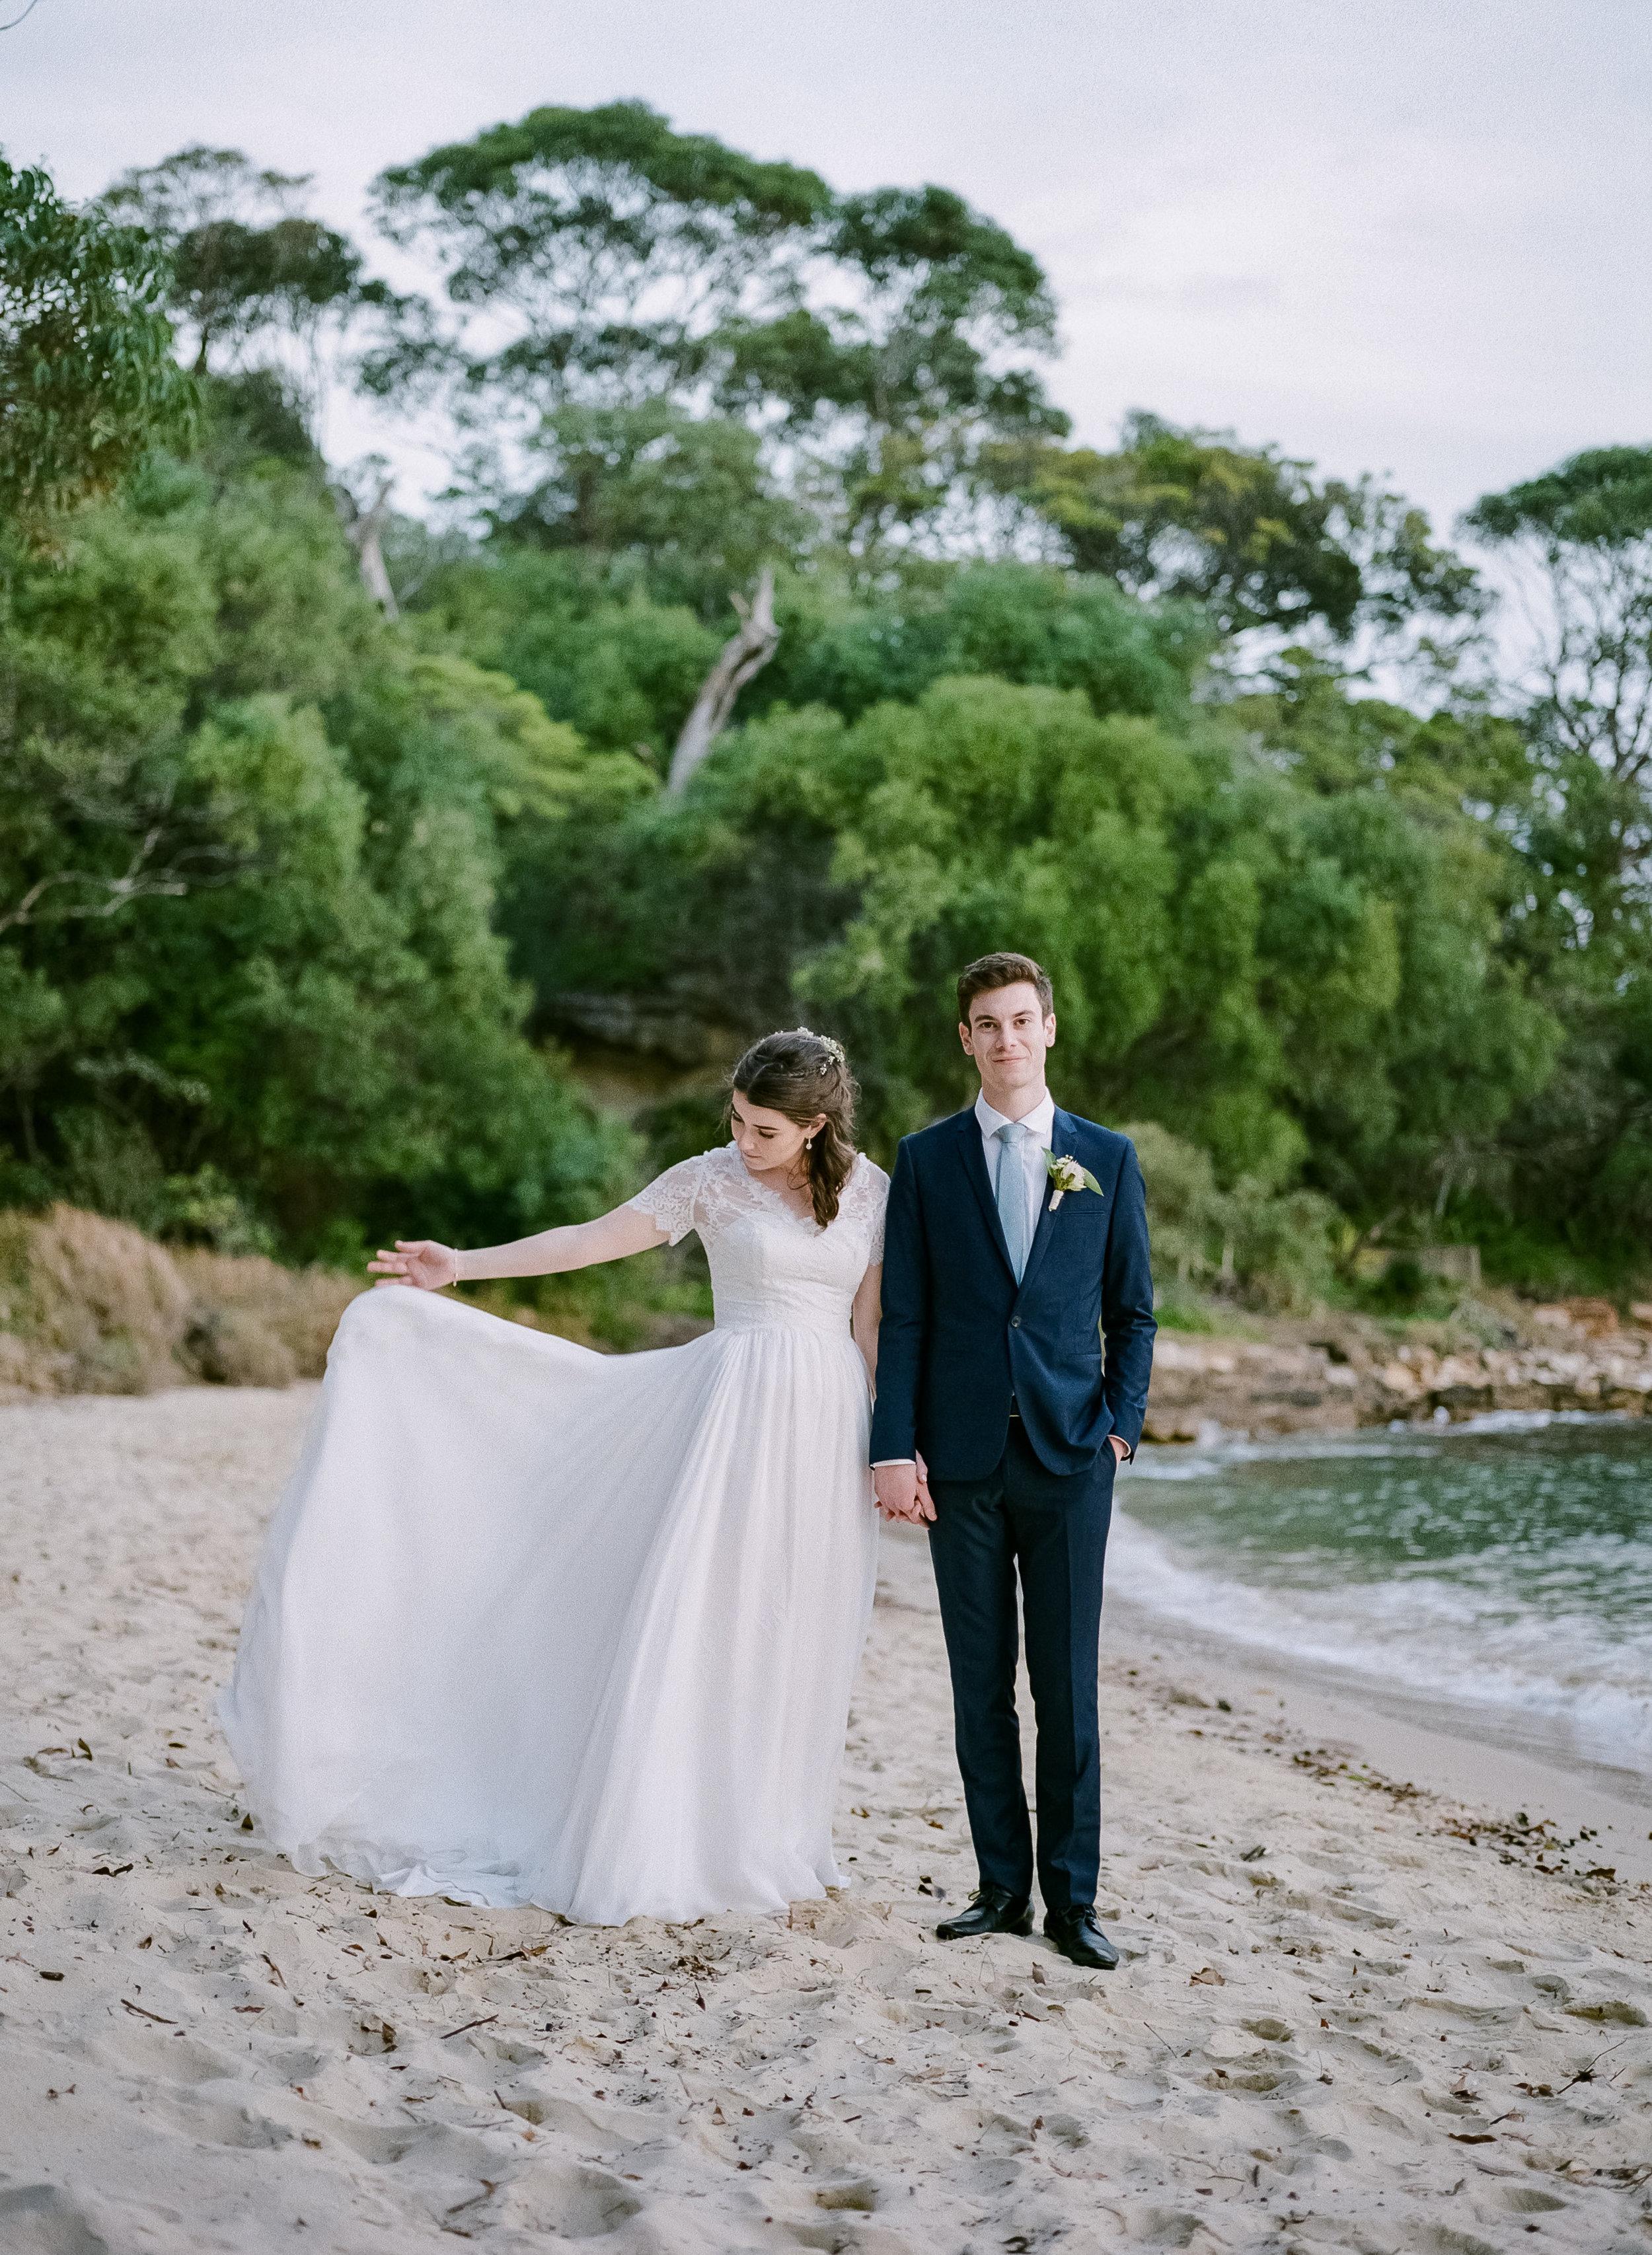 ben-anna-film-fuji-400h-kodak-portra-400-sydney-wedding-photographer-oliversmithphoto-5.jpg